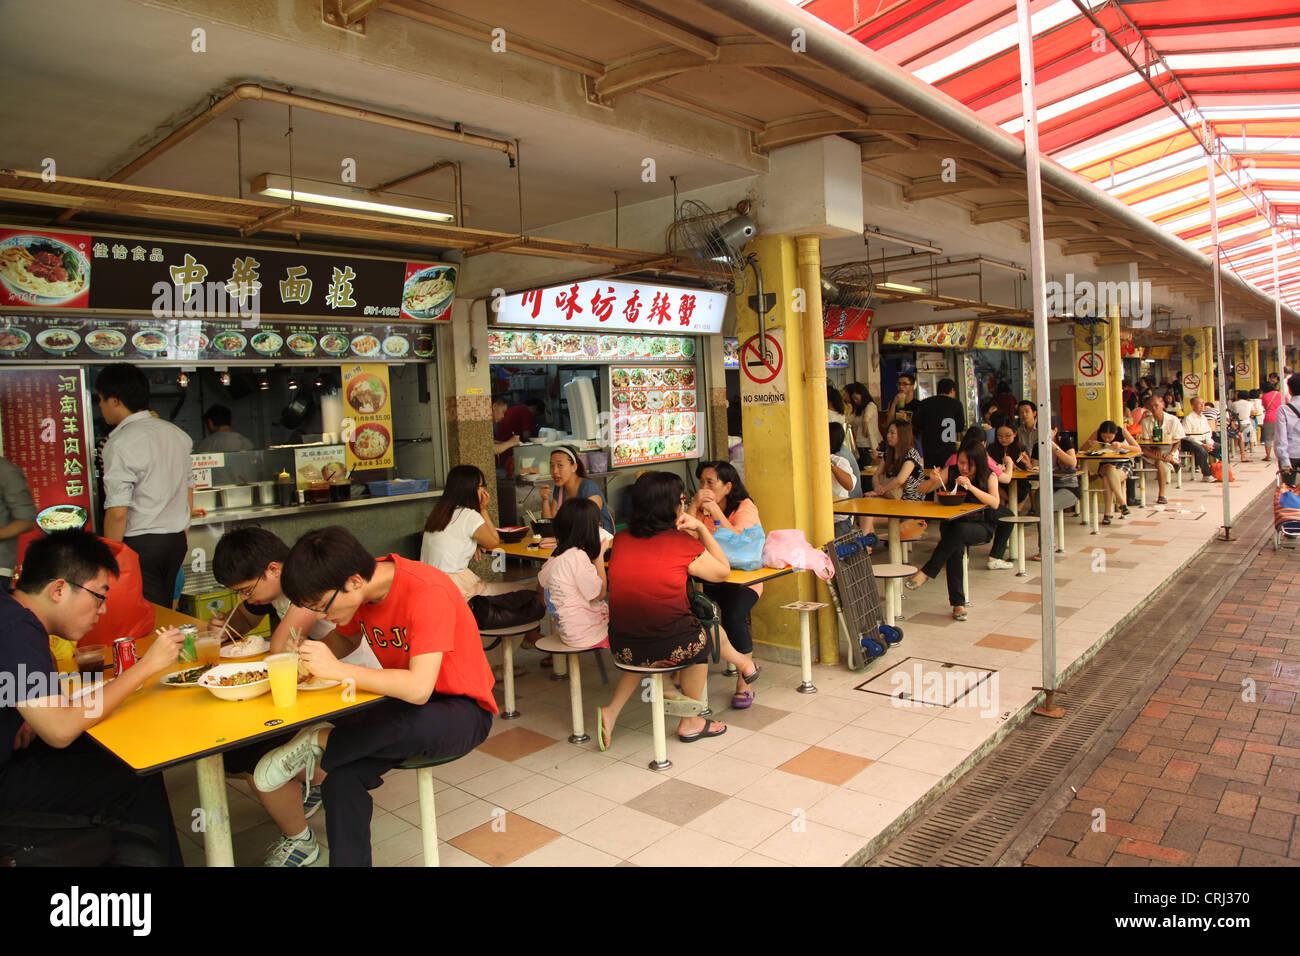 out door restaurant, Singapore - Stock Image